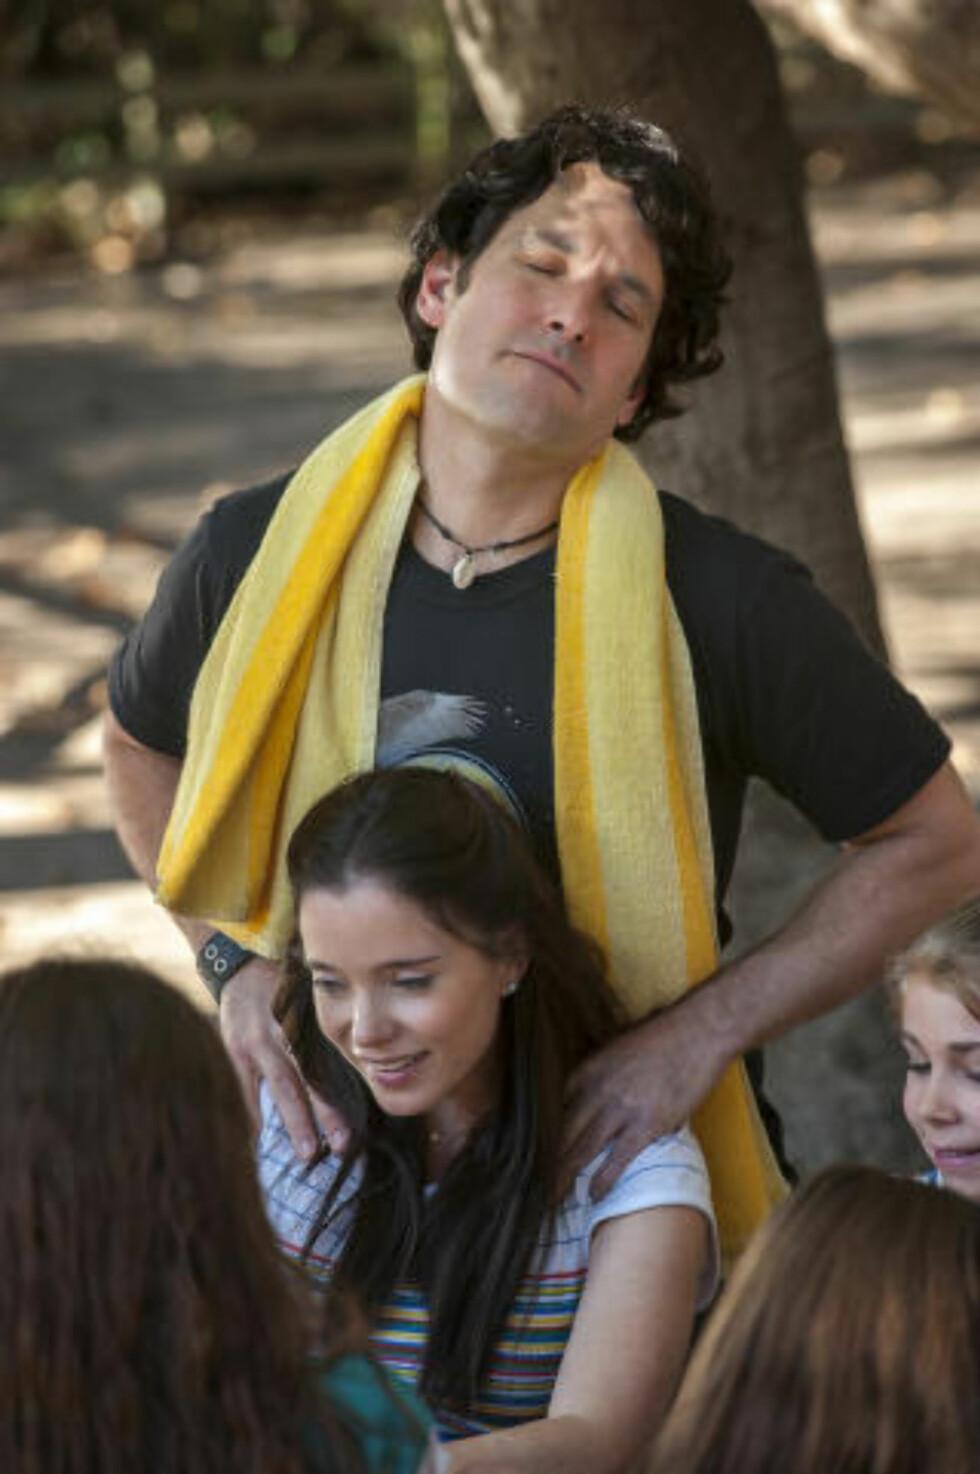 UFORDRAGELIG: Paul Rudd spiller en usedvanlig ufordragelig tenåring i «Wet Hot American Summer». Marguerite Moreau spiller kjæresten. Foto: Gemma La Mana / Netflix